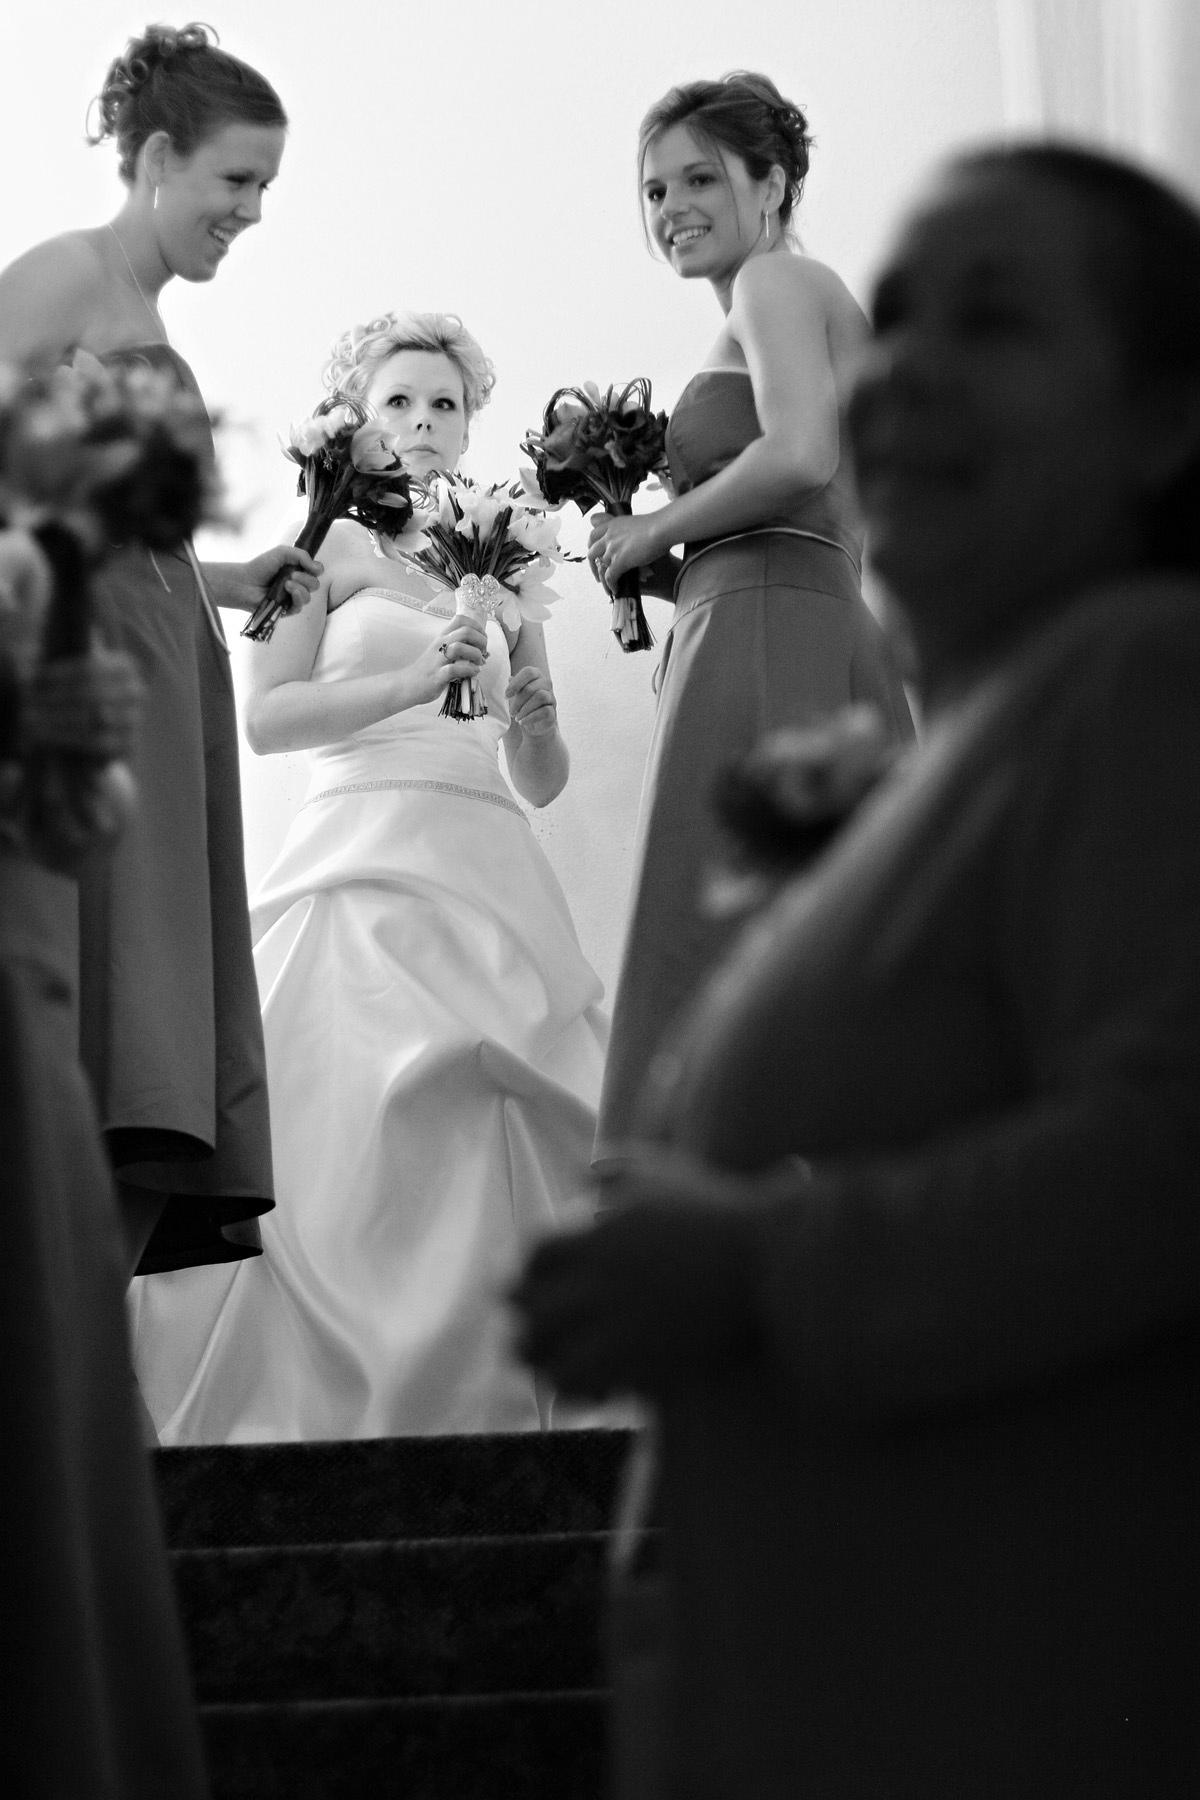 minneapolis-wedding-photography-mark-kegans-345.jpg